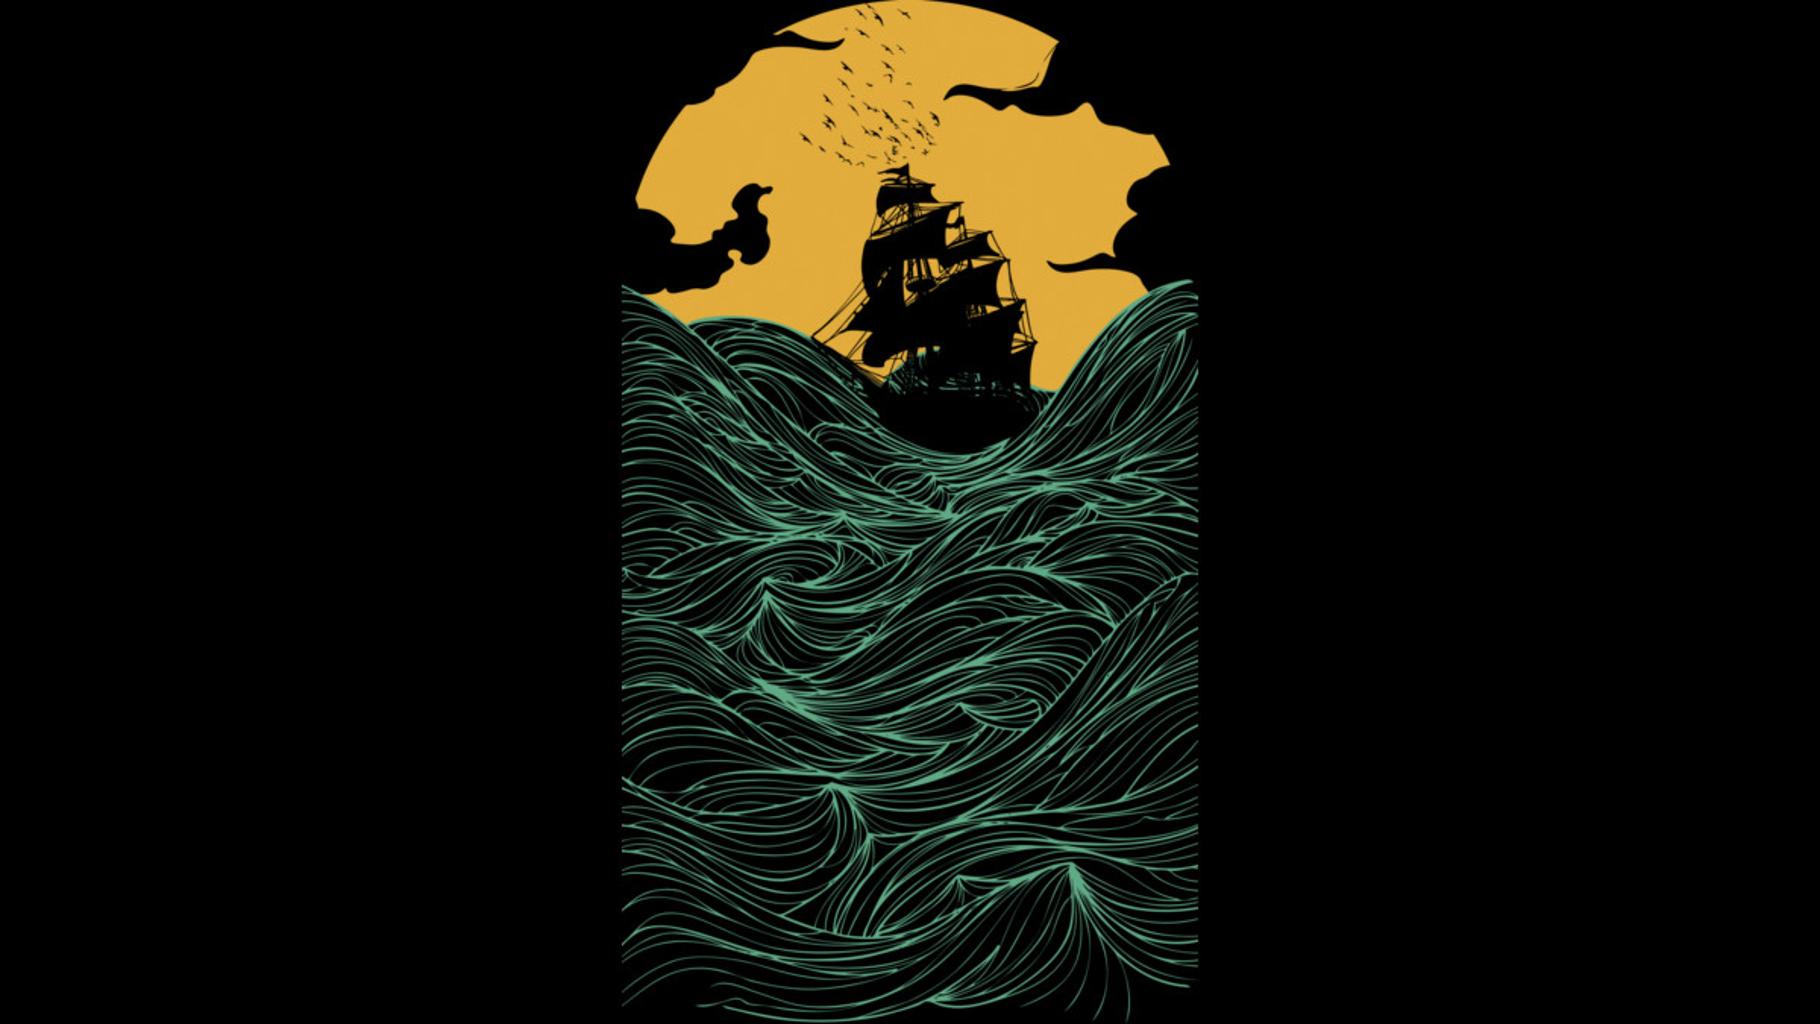 Design by Humans: High seas